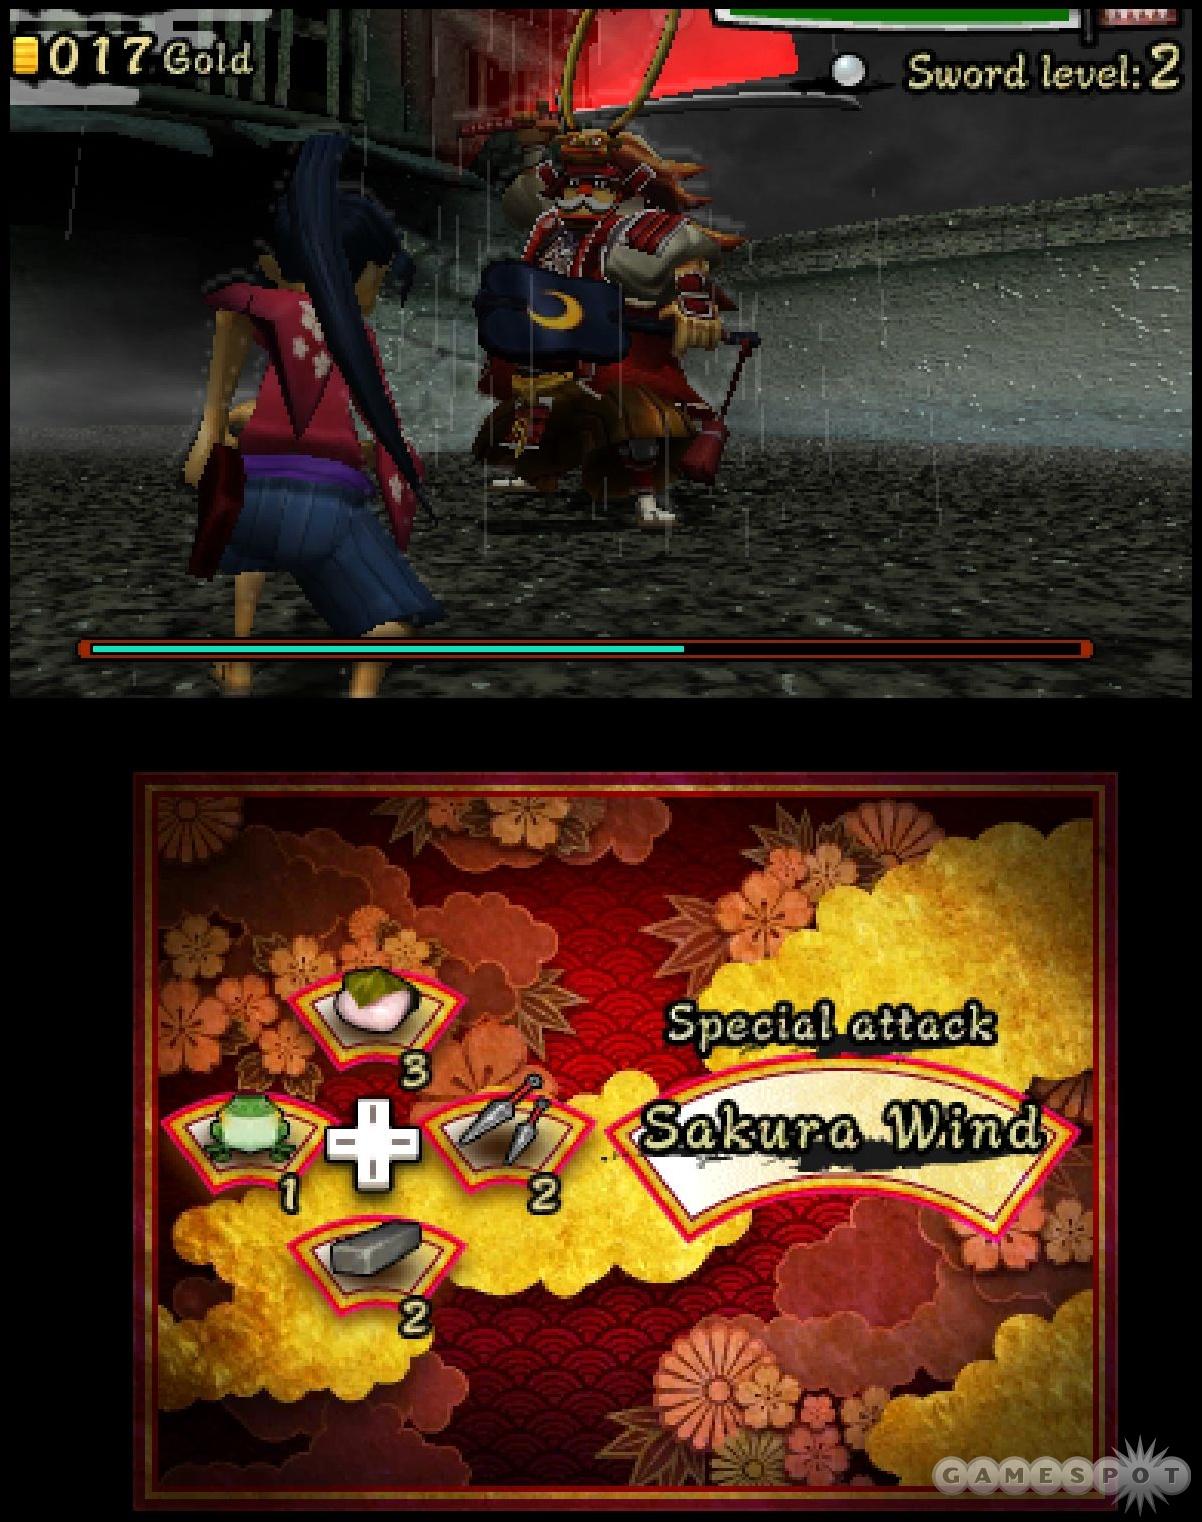 Boss fights test your sword skills.